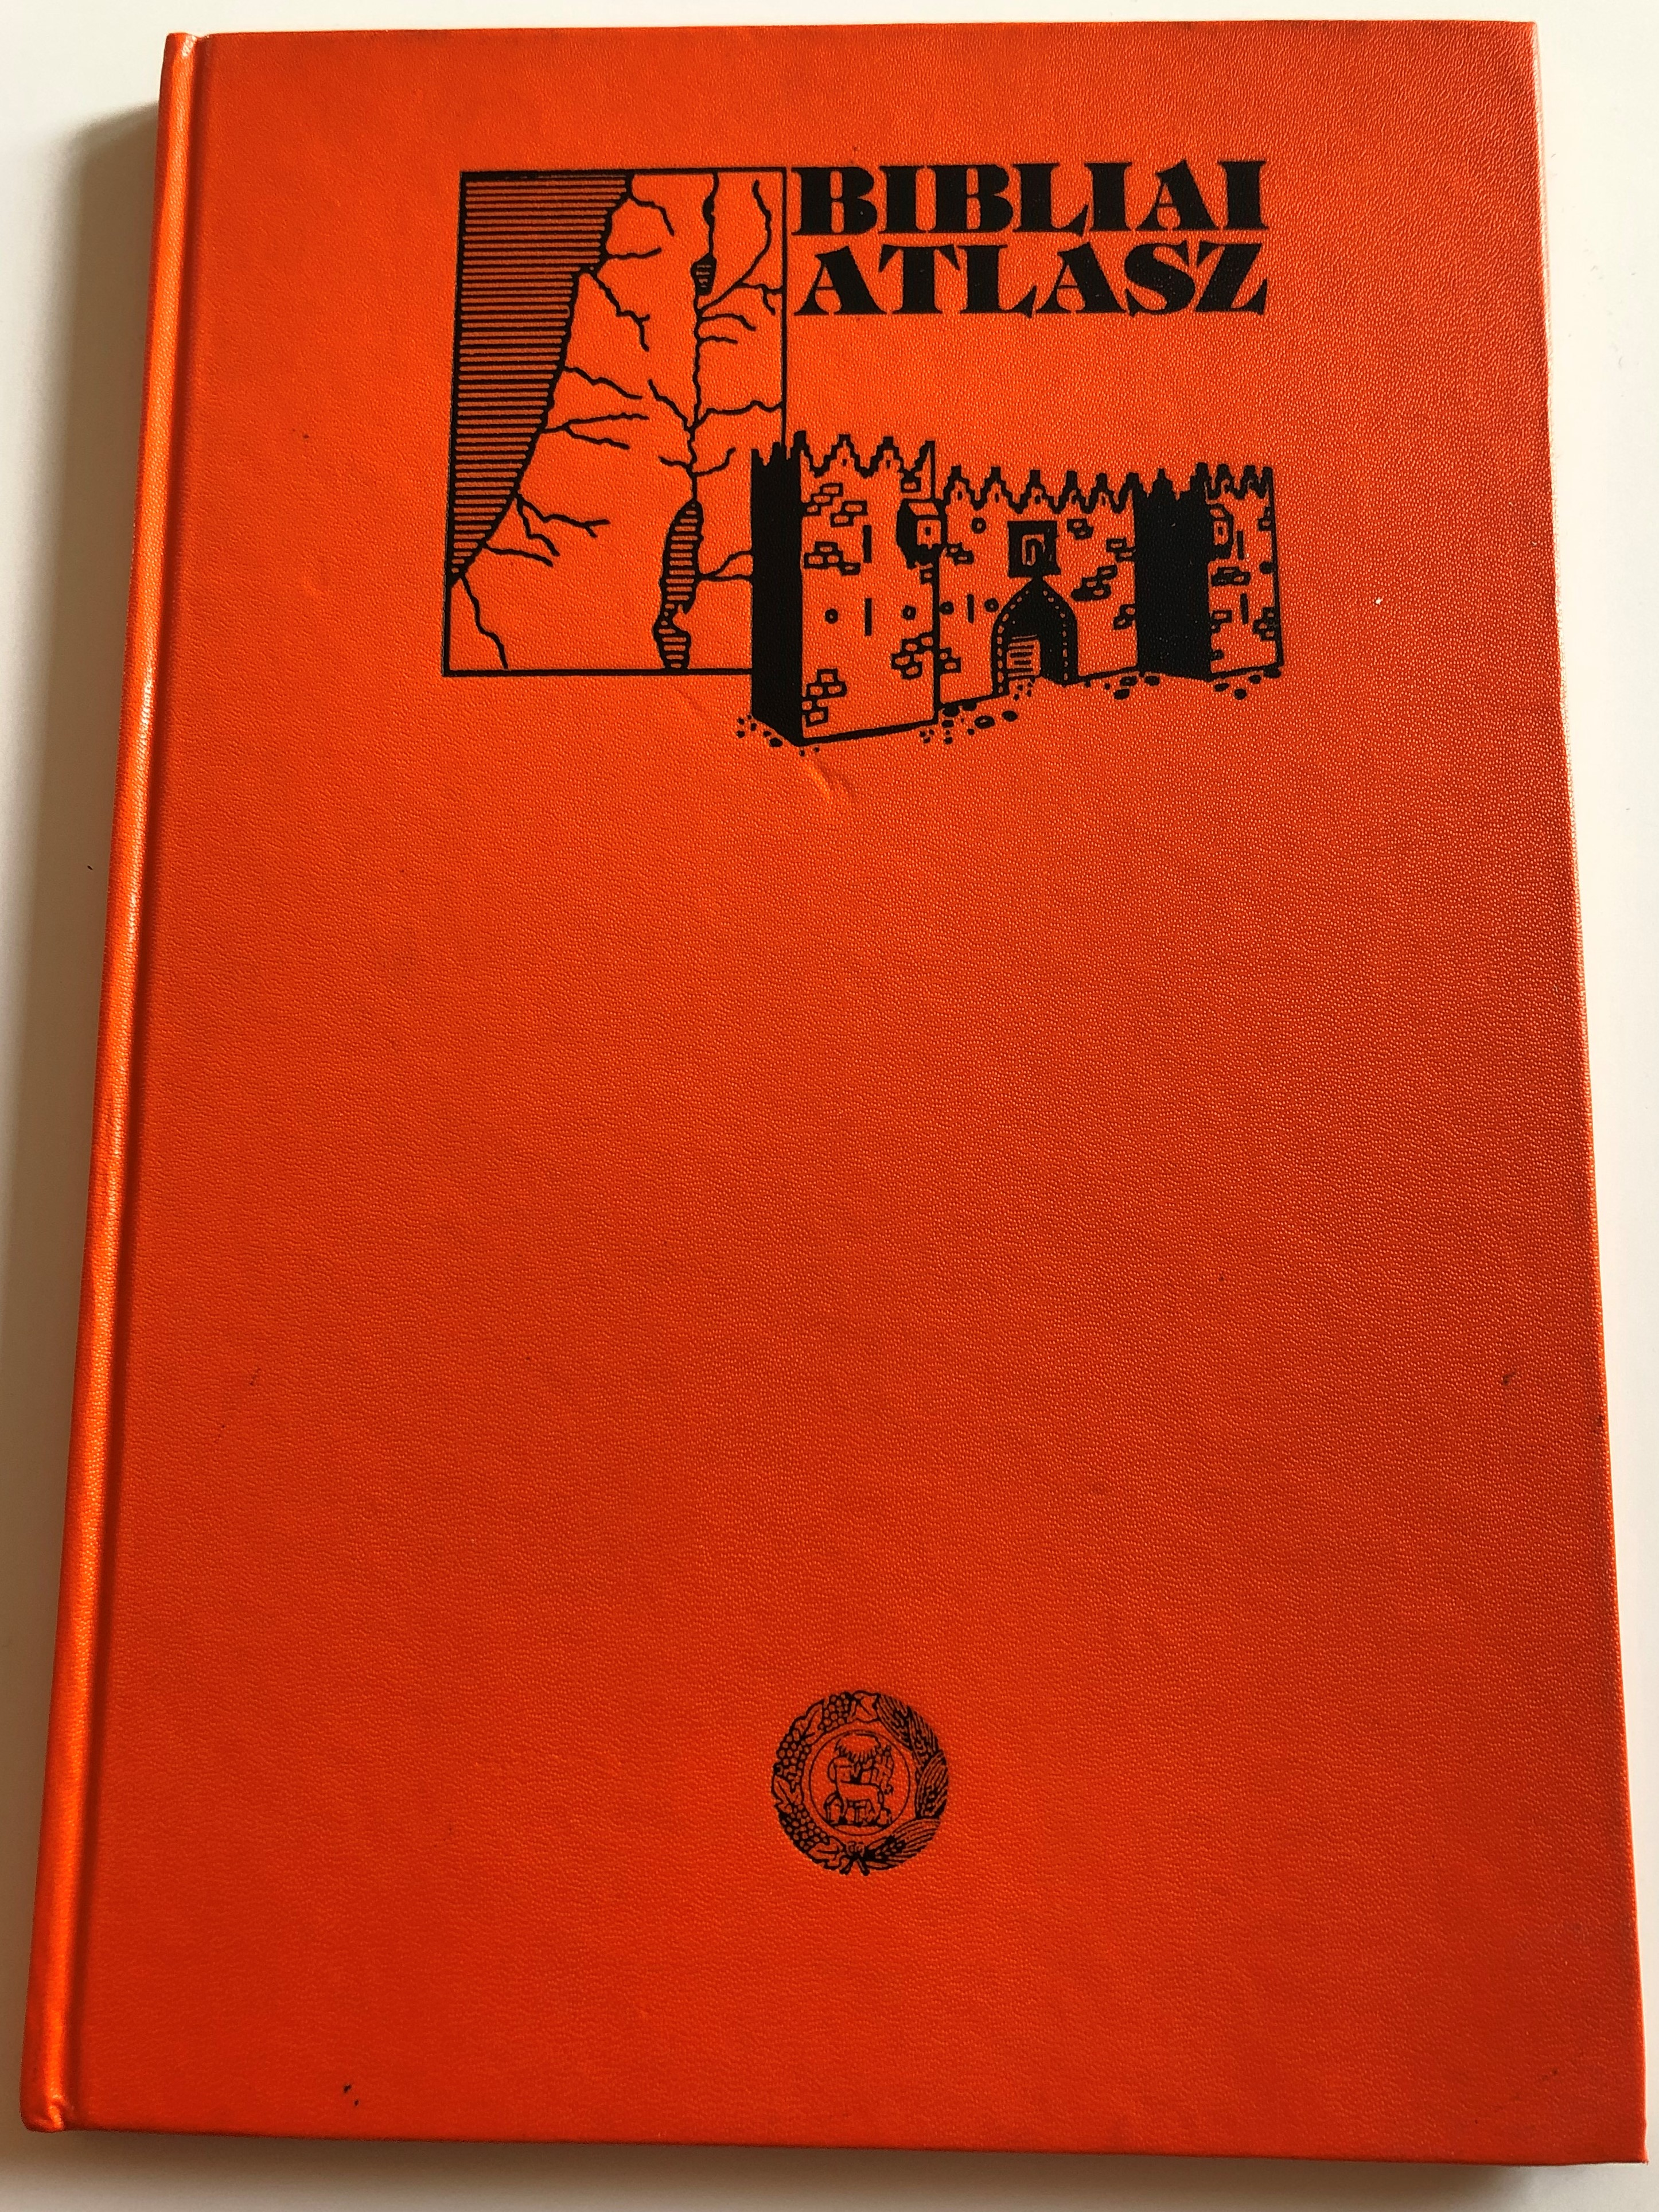 bibliai-atlasz-1991-hungarian-language-bible-atlas-1.jpg